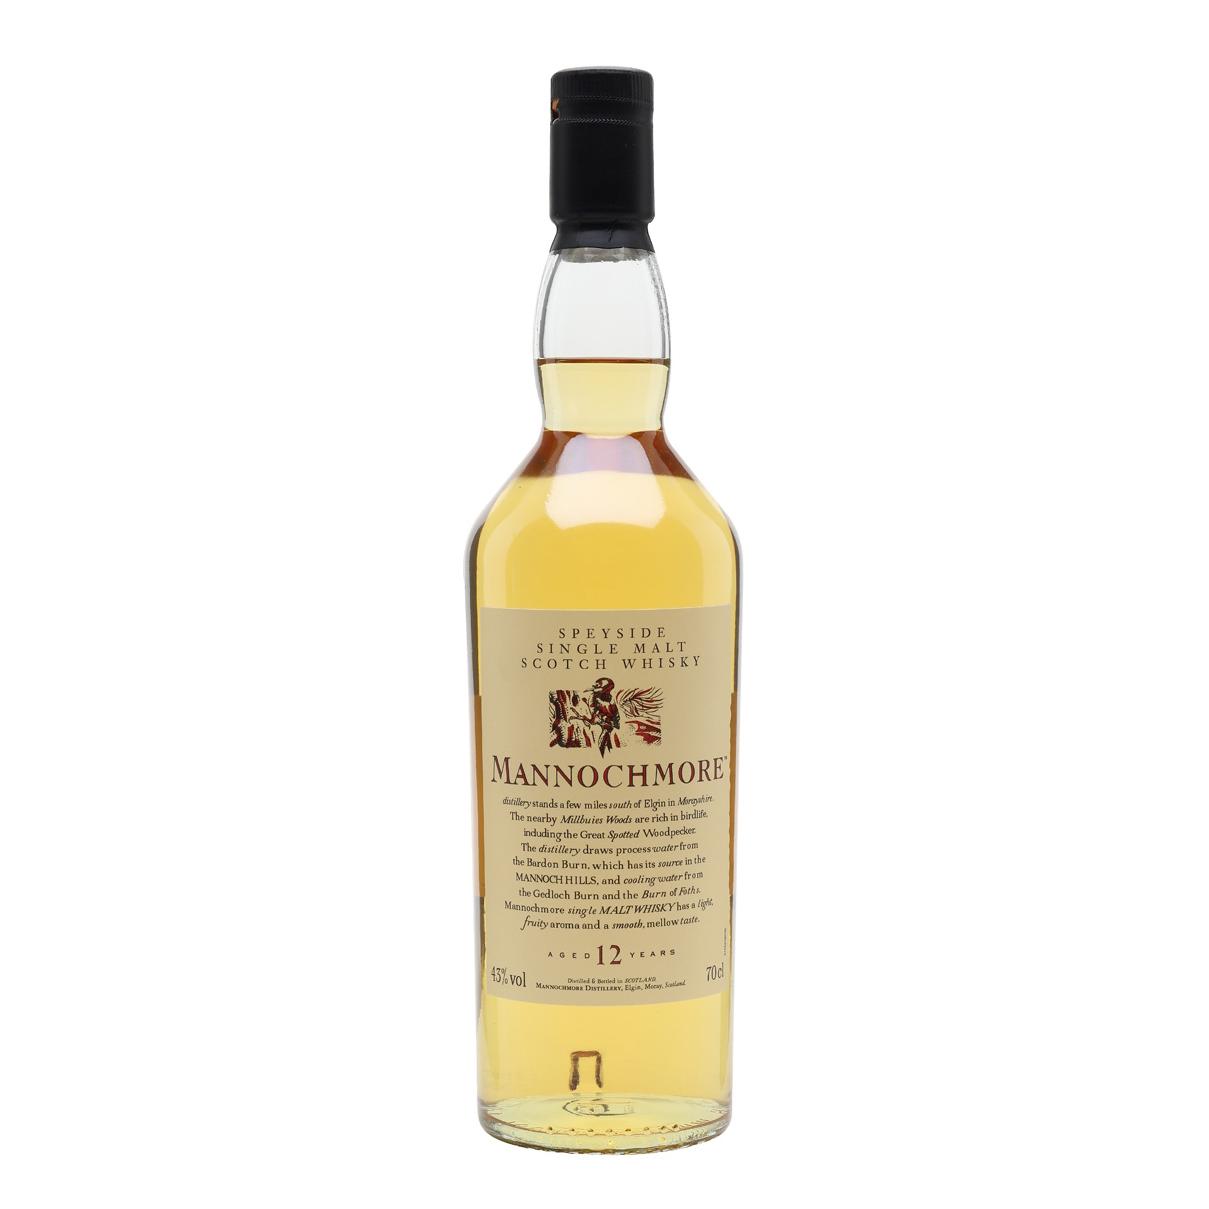 Mannochmore Flora & Fauna 12 Year Old Speyside Single Malt Scotch Whisky Diageo